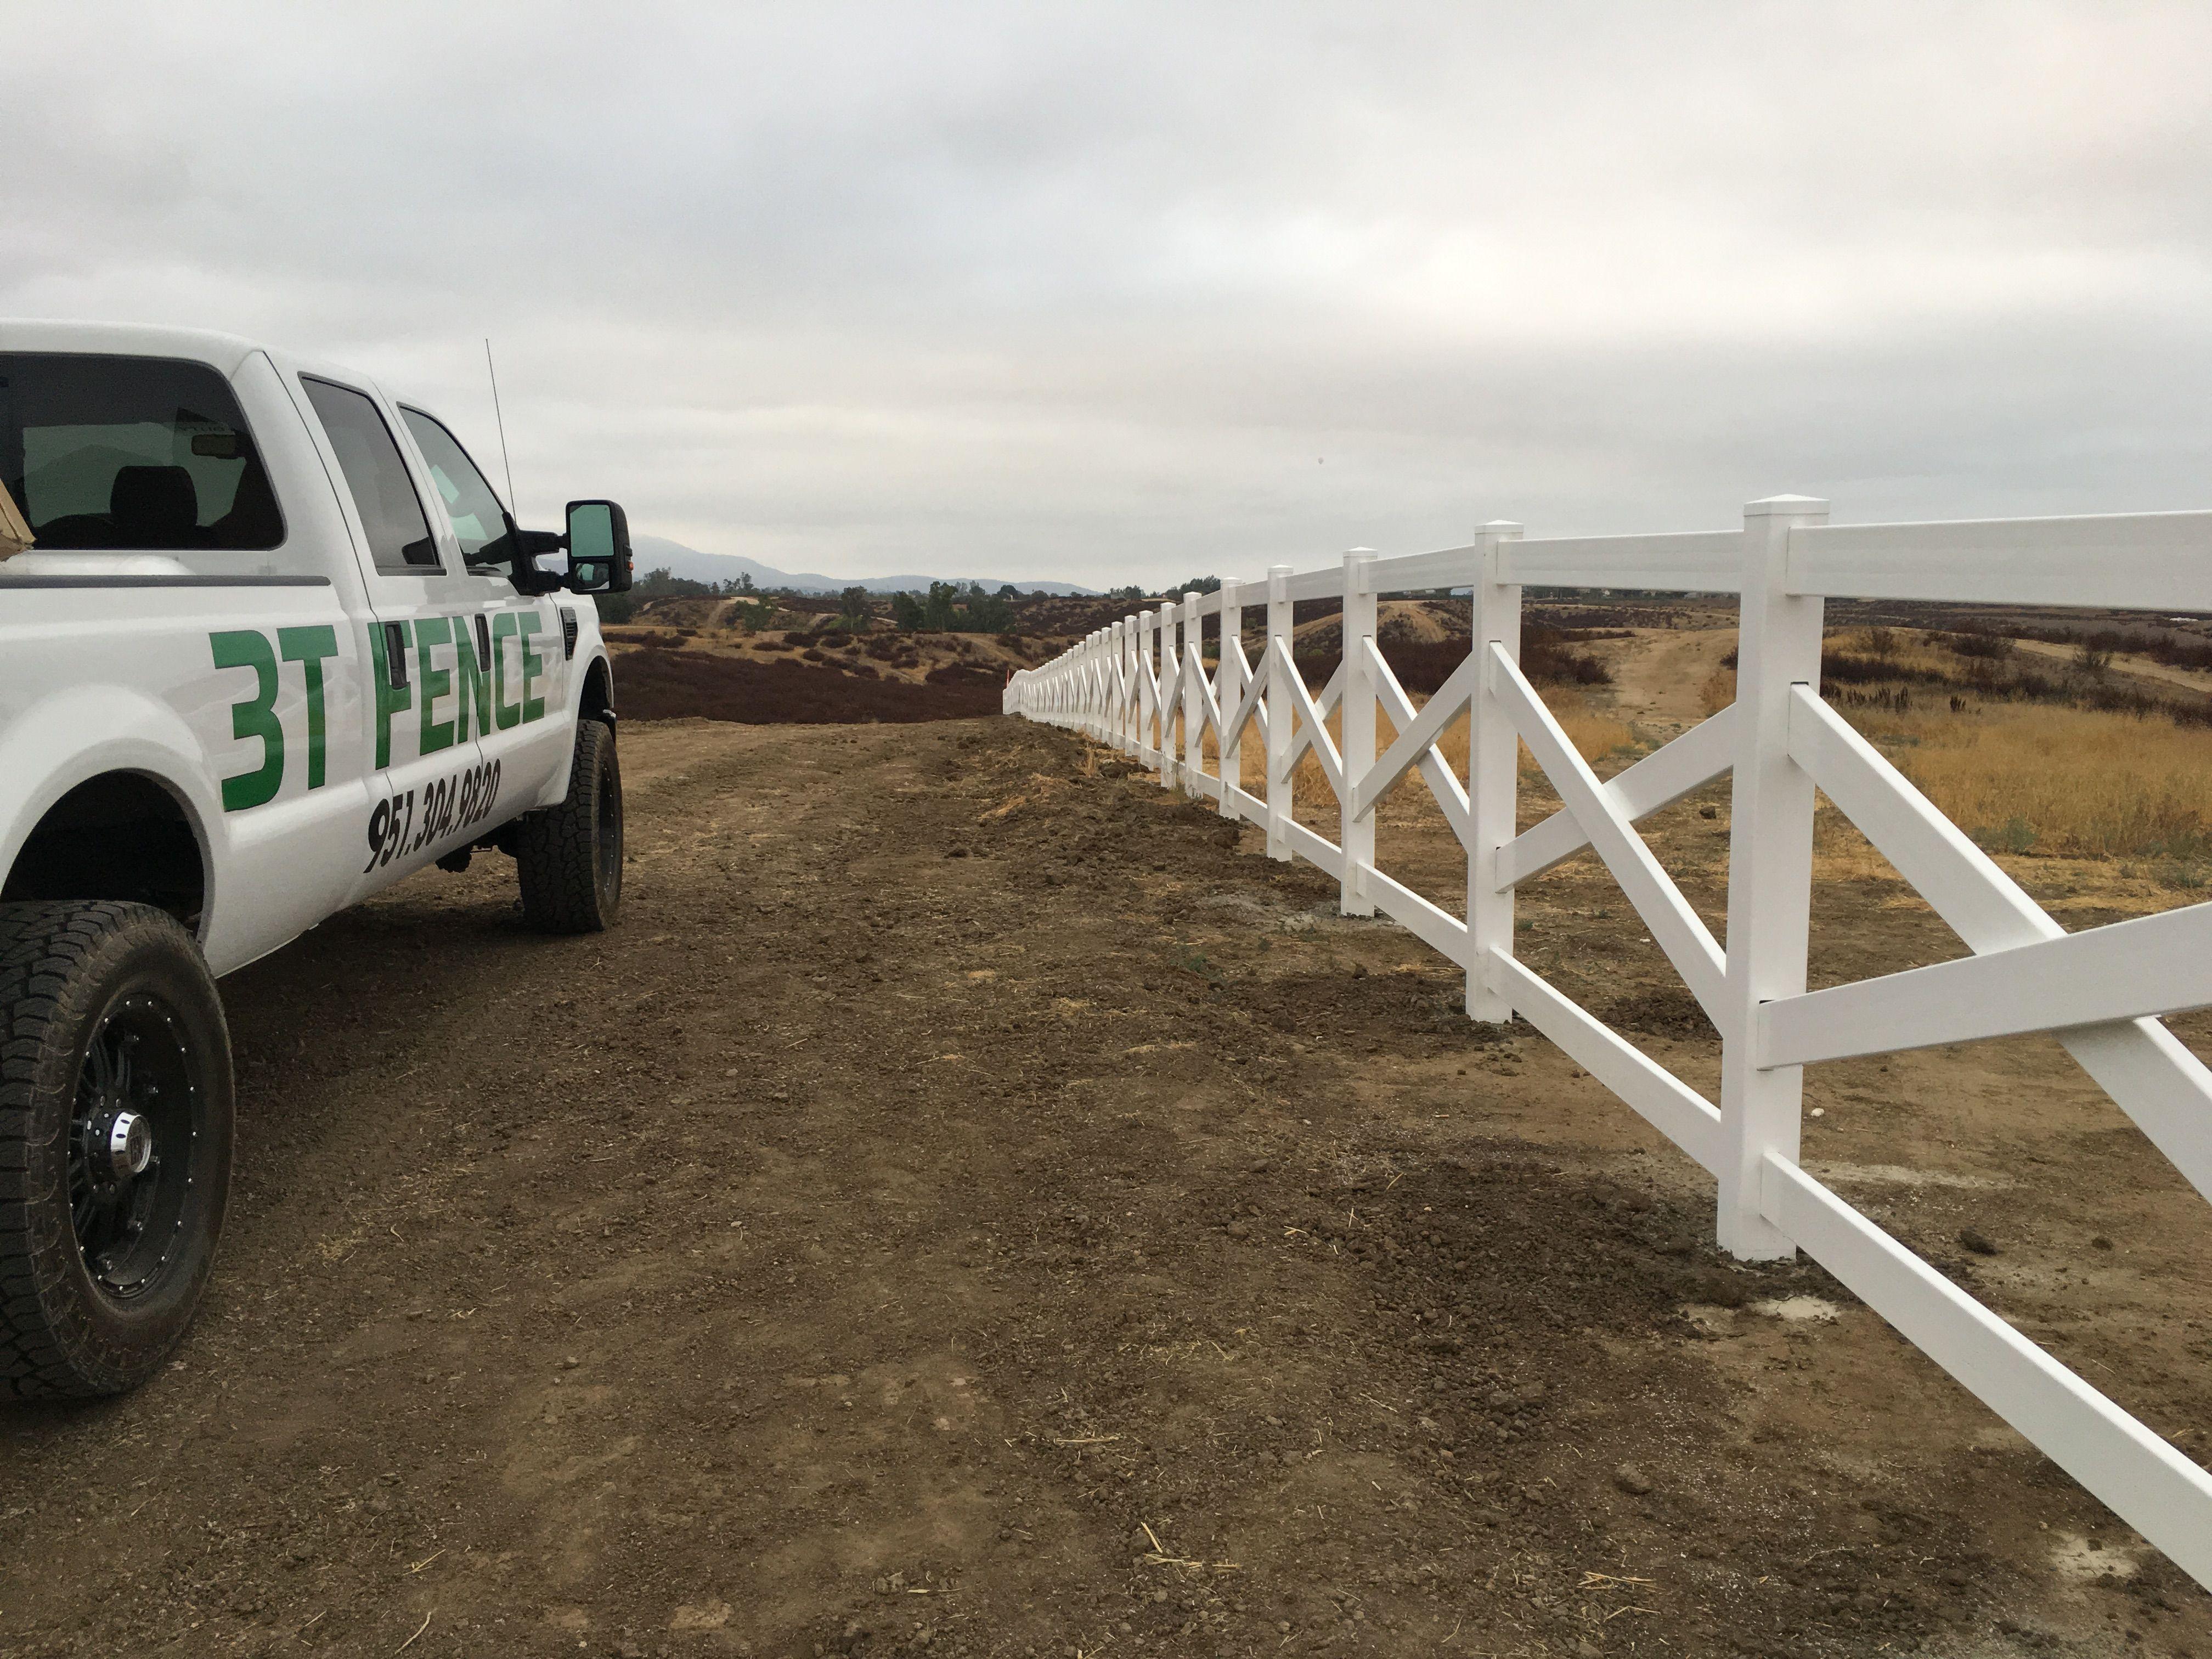 Cross Rail Vinyl Fence installed in Temecula California ...